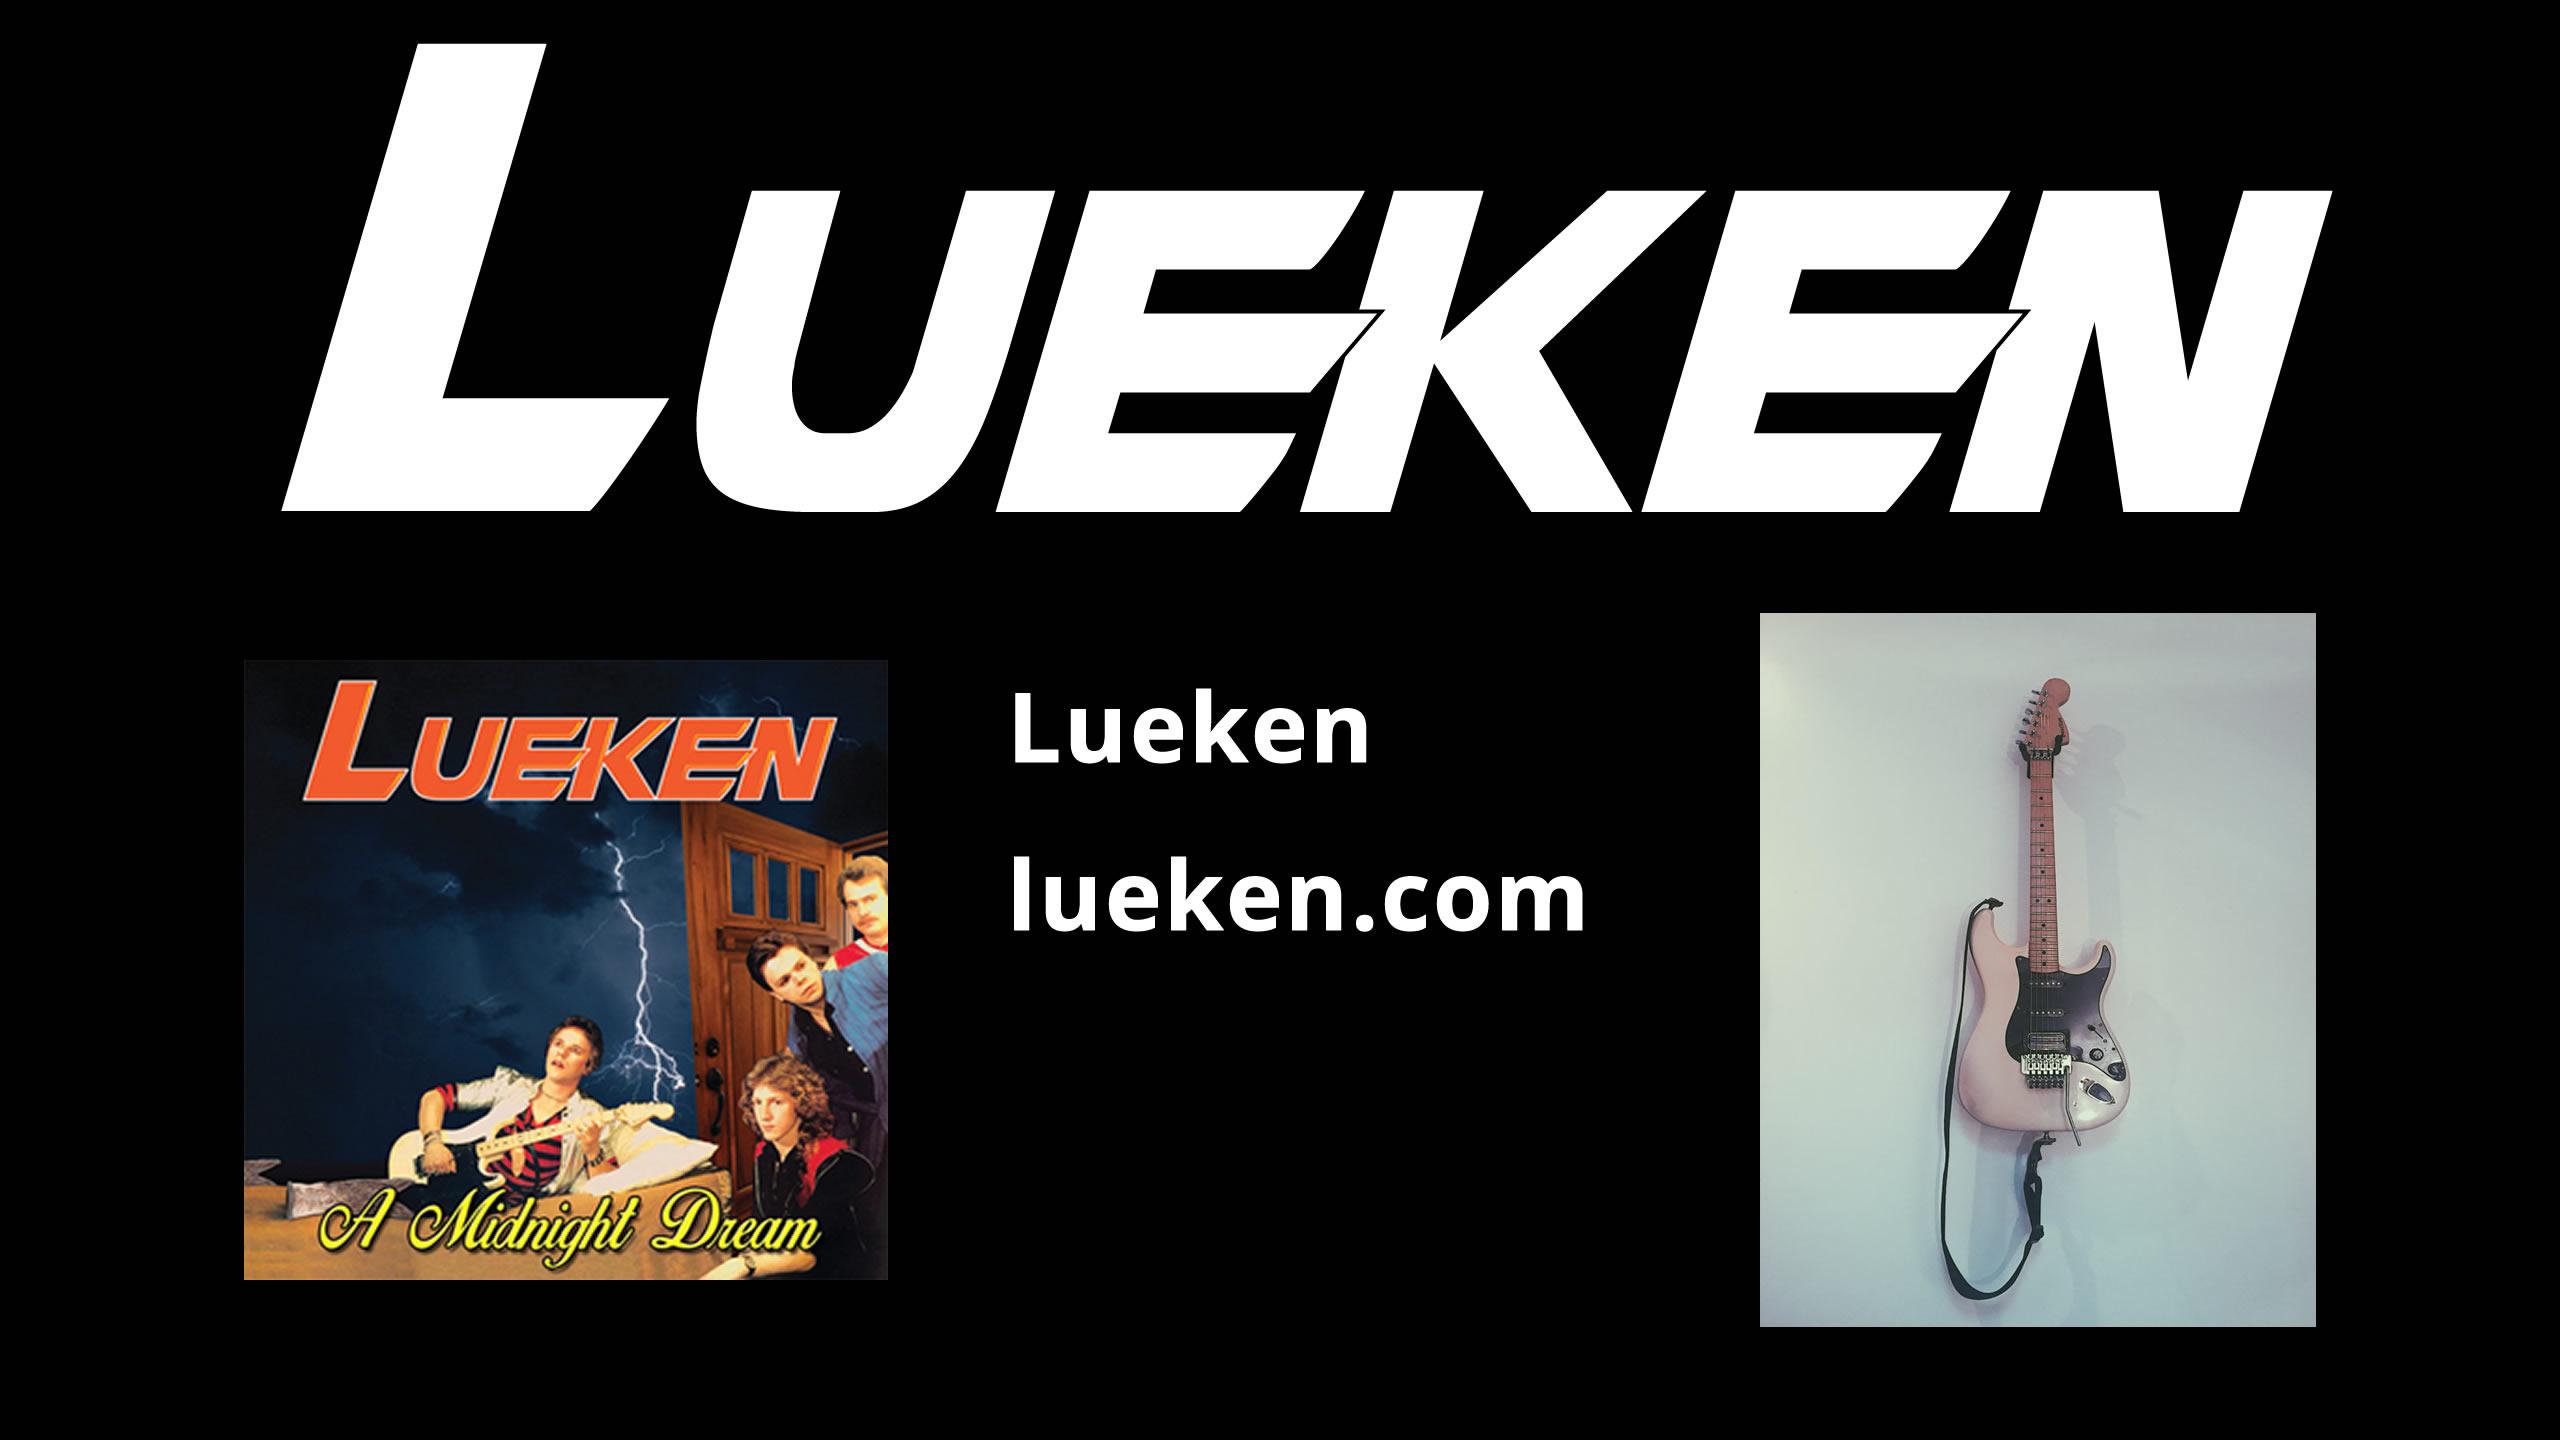 Lueken.com